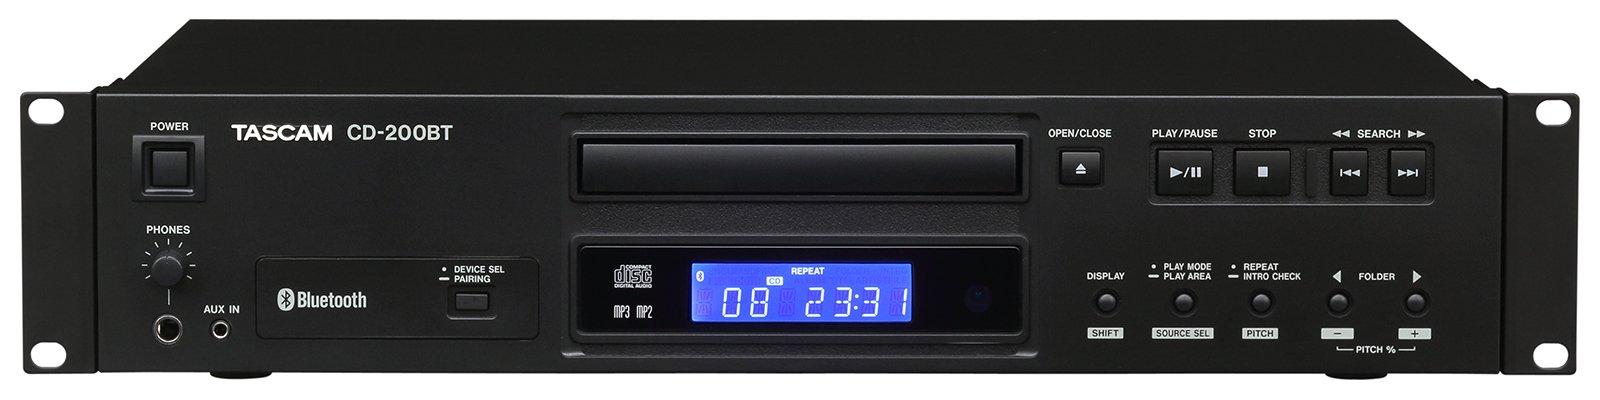 Tascam 200BT CD player w bluetooth